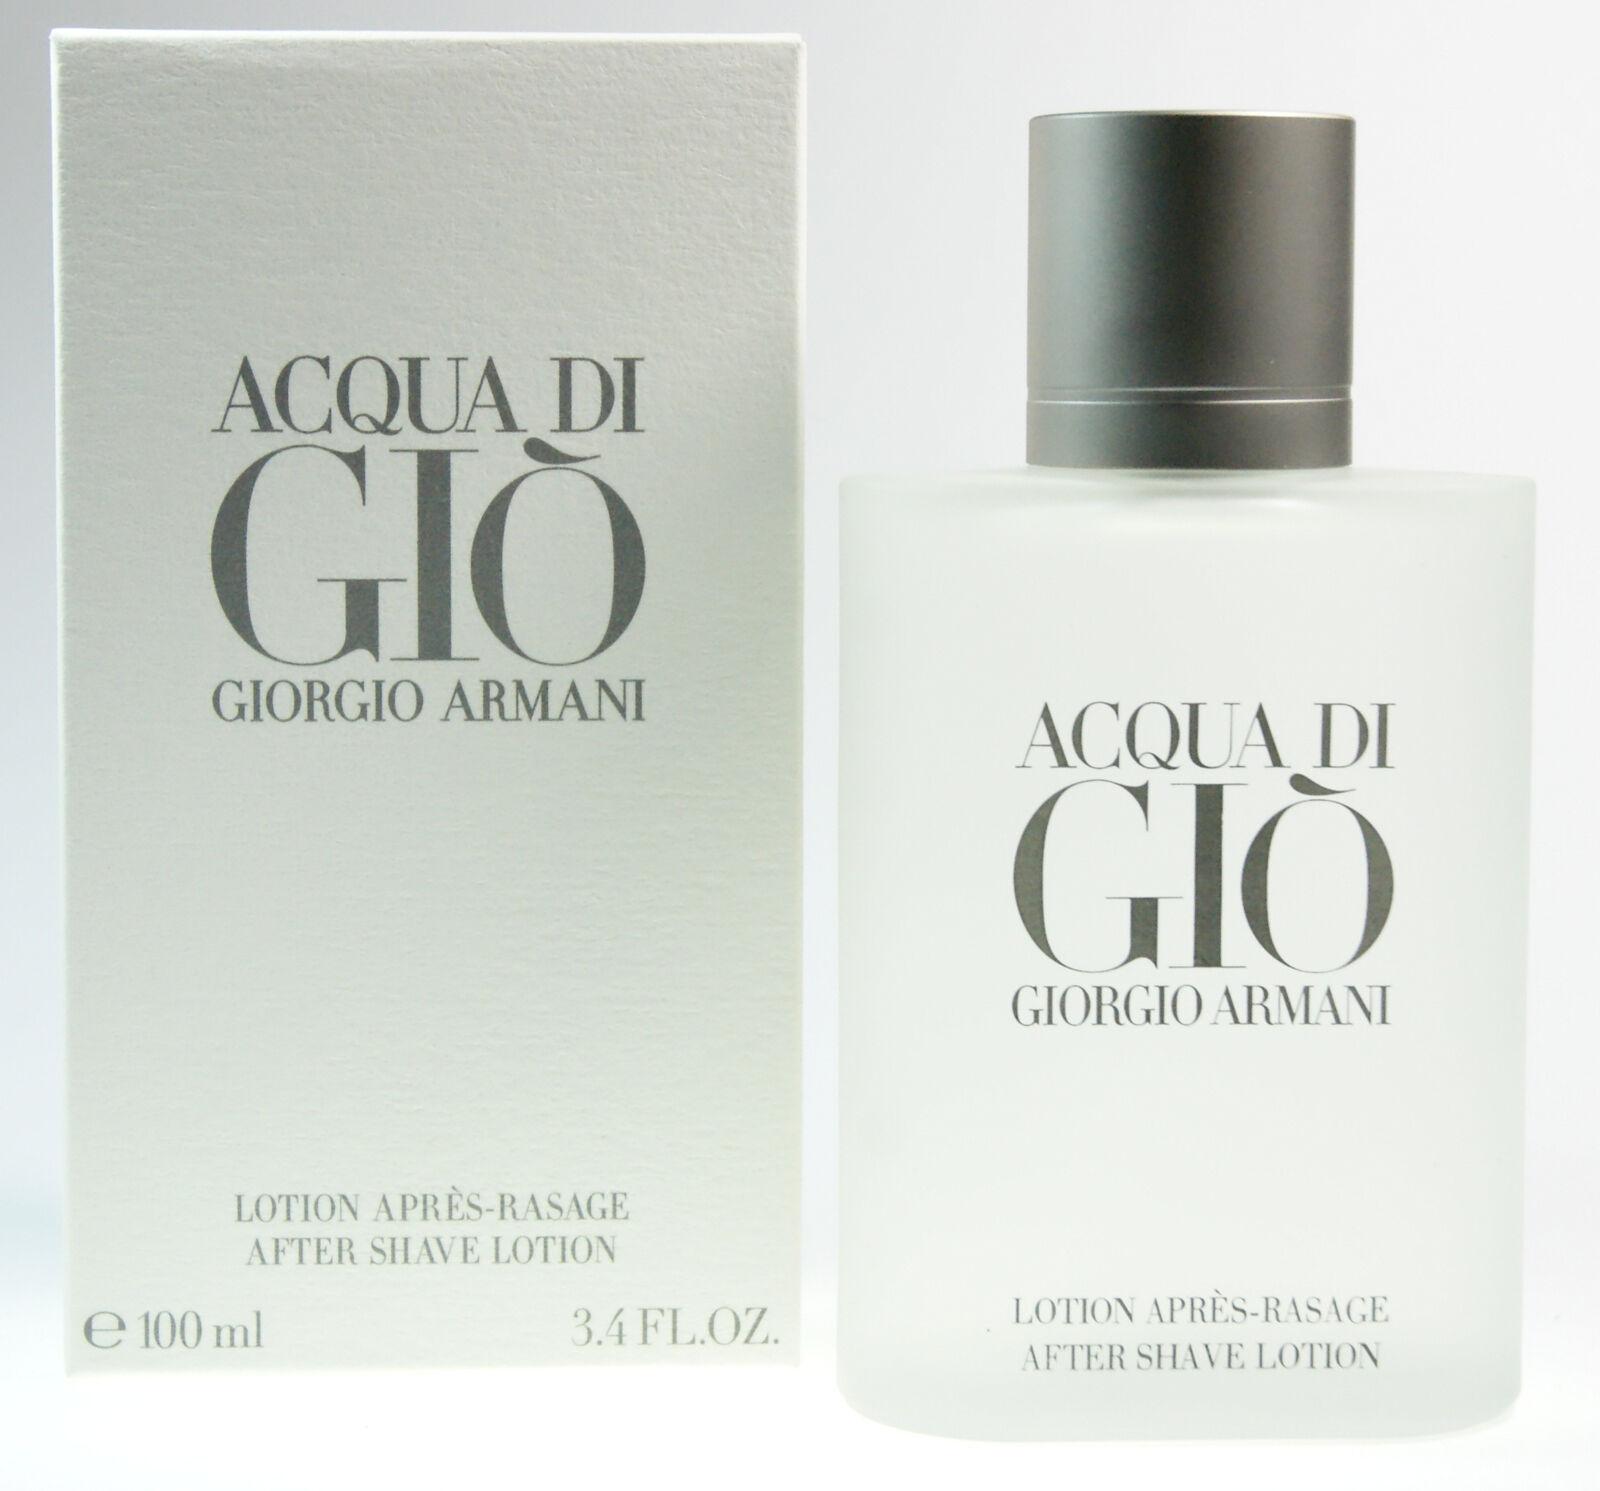 купить Giorgio Armani Acqua Di Gio Homme After Shave на Ebayde из